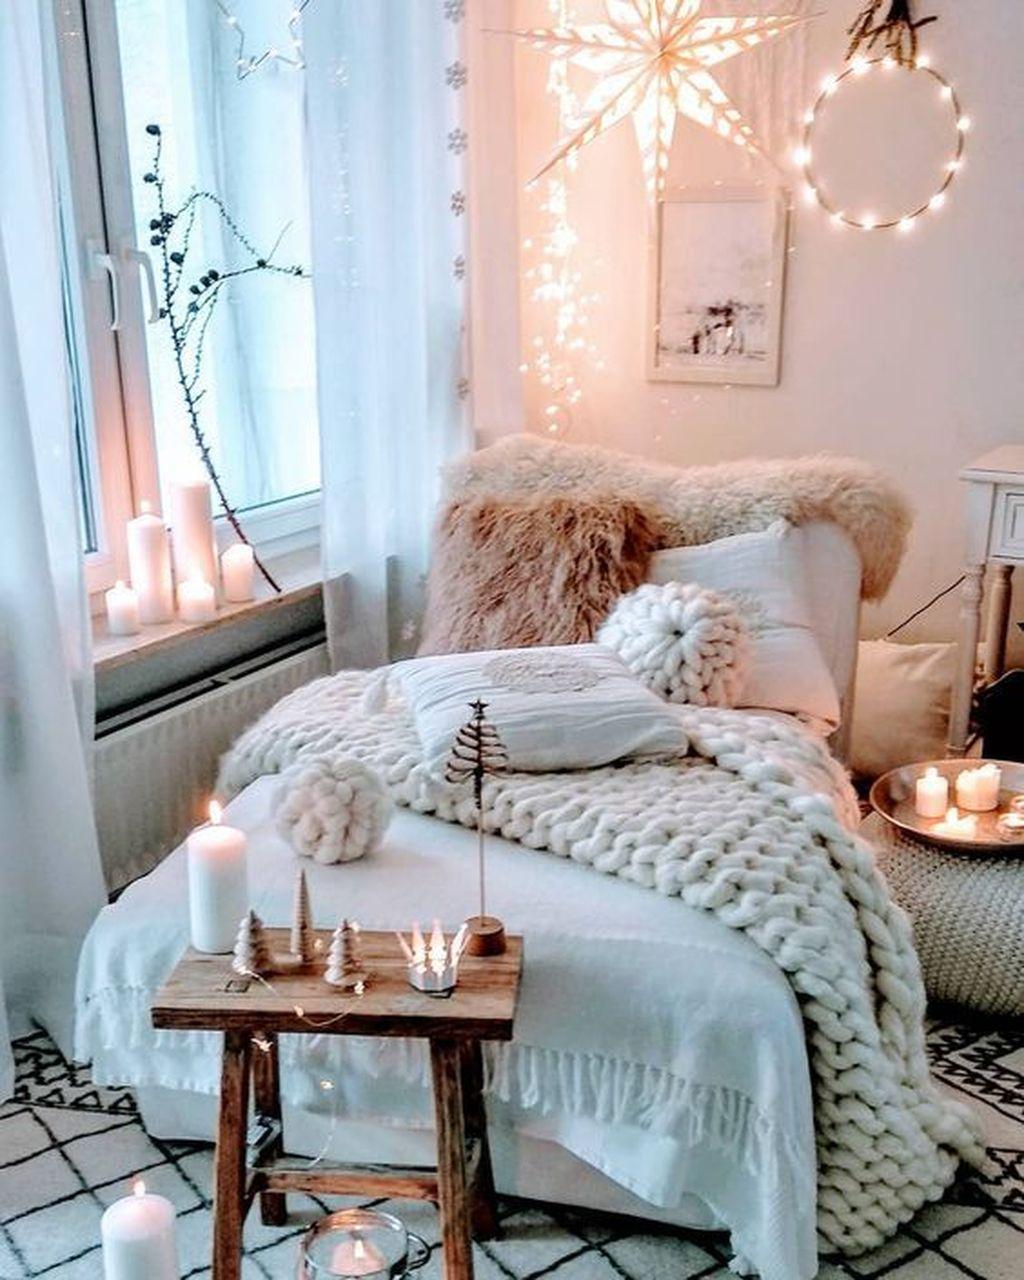 Stunning Bedding Ideas For Cozy Bedroom 27